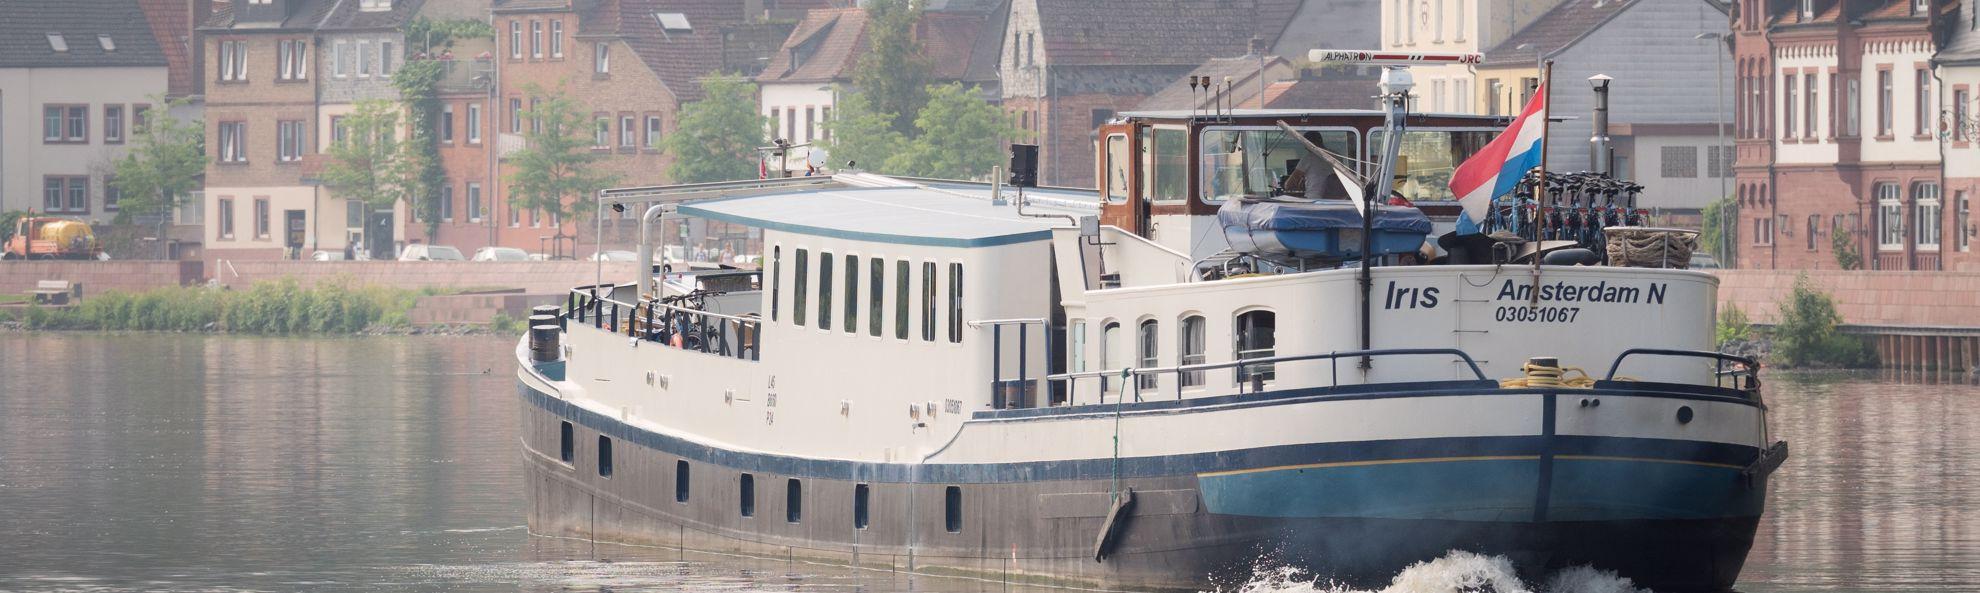 Moselle River Bike & Barge